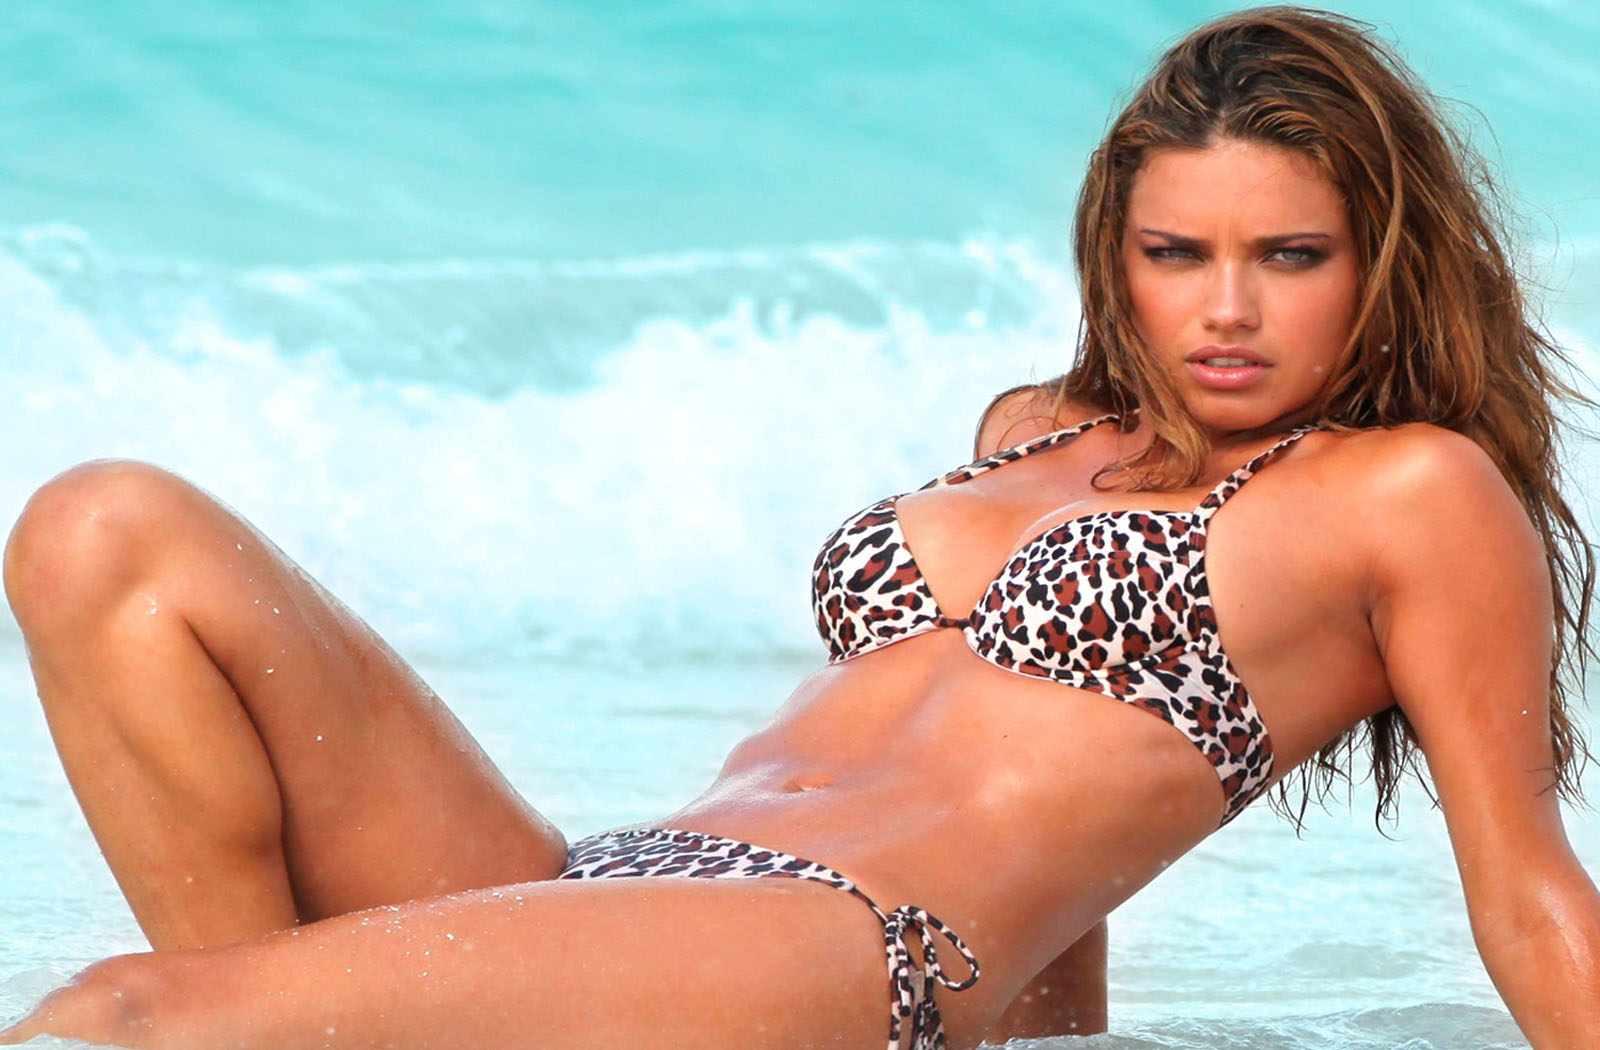 Isabeli Fontana. Biography of the Brazilian model